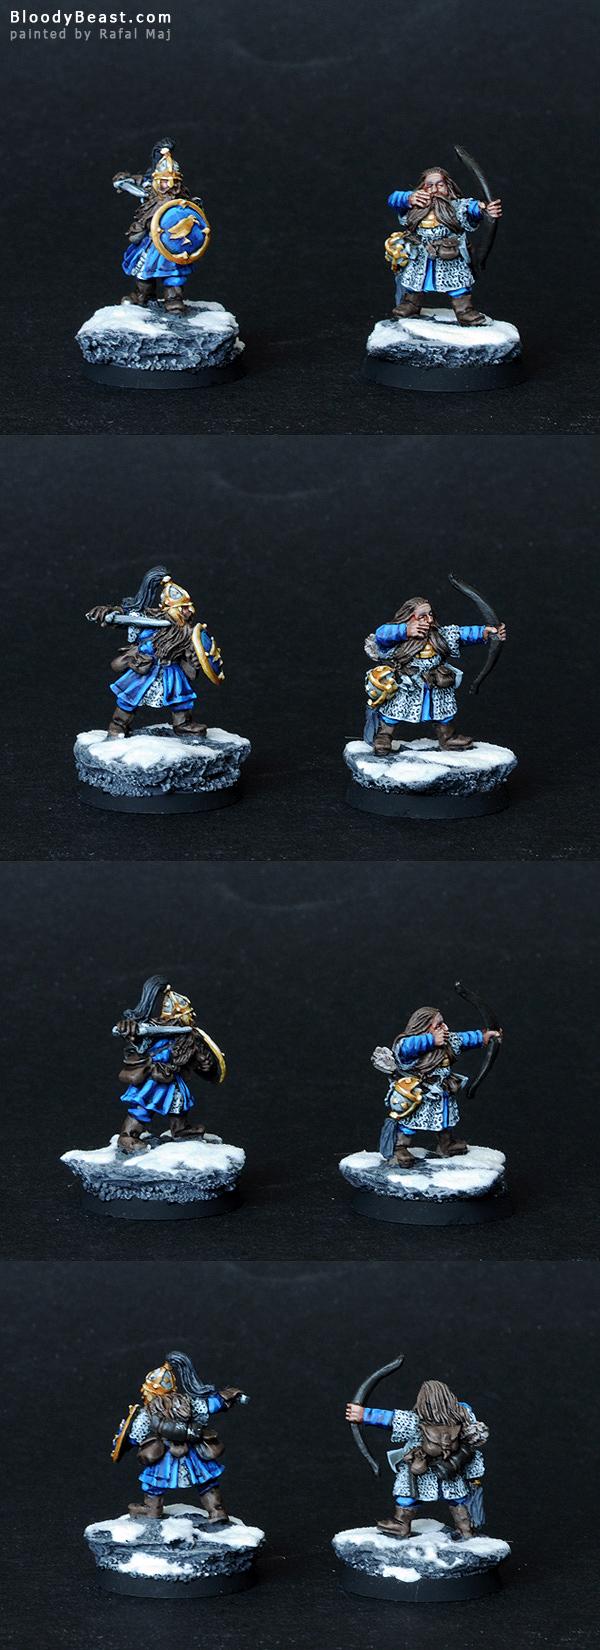 Dwarf Murin and Drar painted by Rafal Maj (BloodyBeast.com)